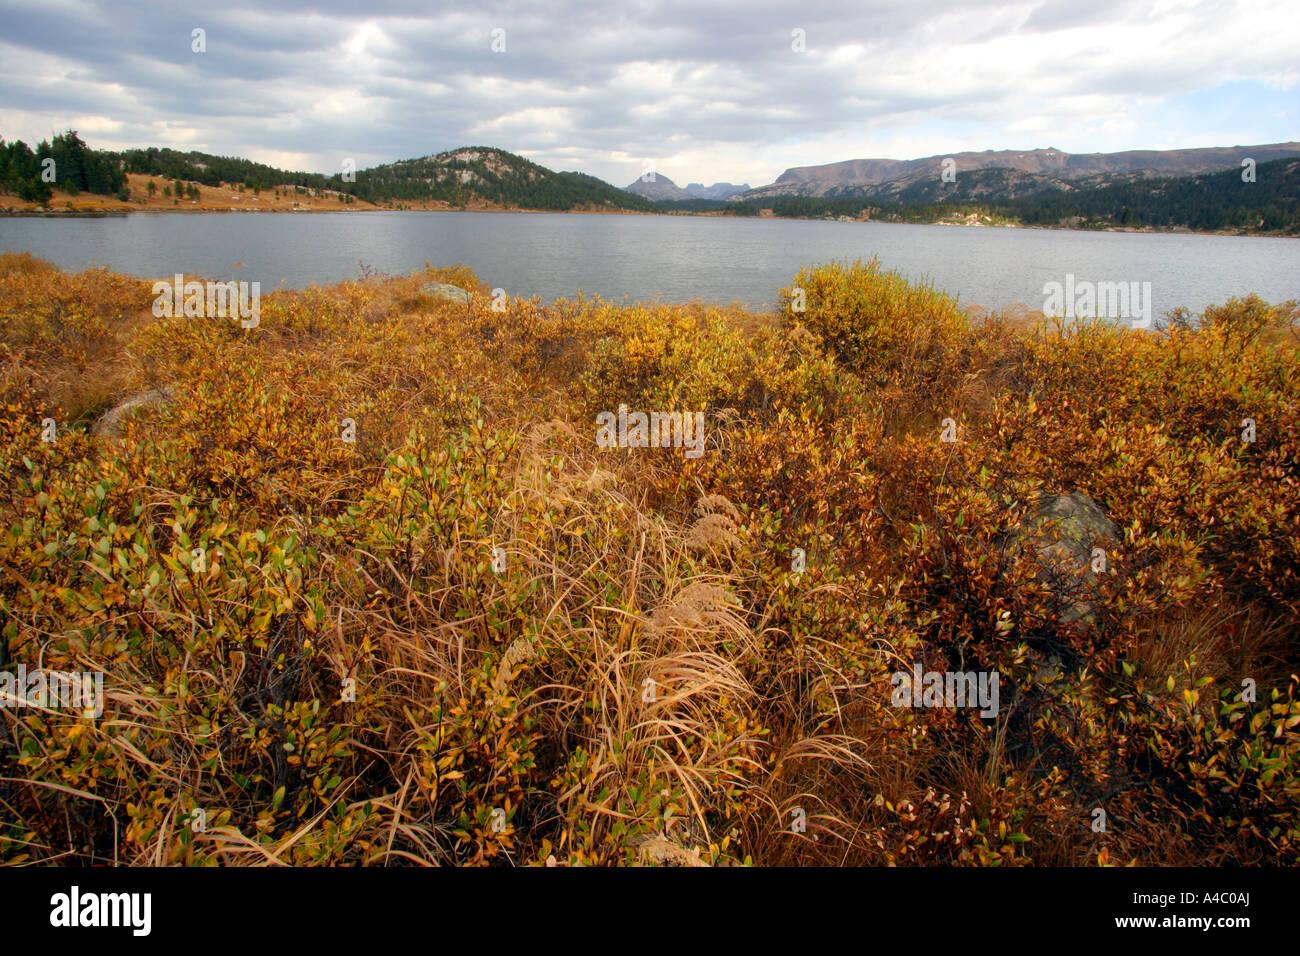 Lago de la isla fuera de la autopista, beartooth Shoshone National Forest, Wyoming Foto de stock